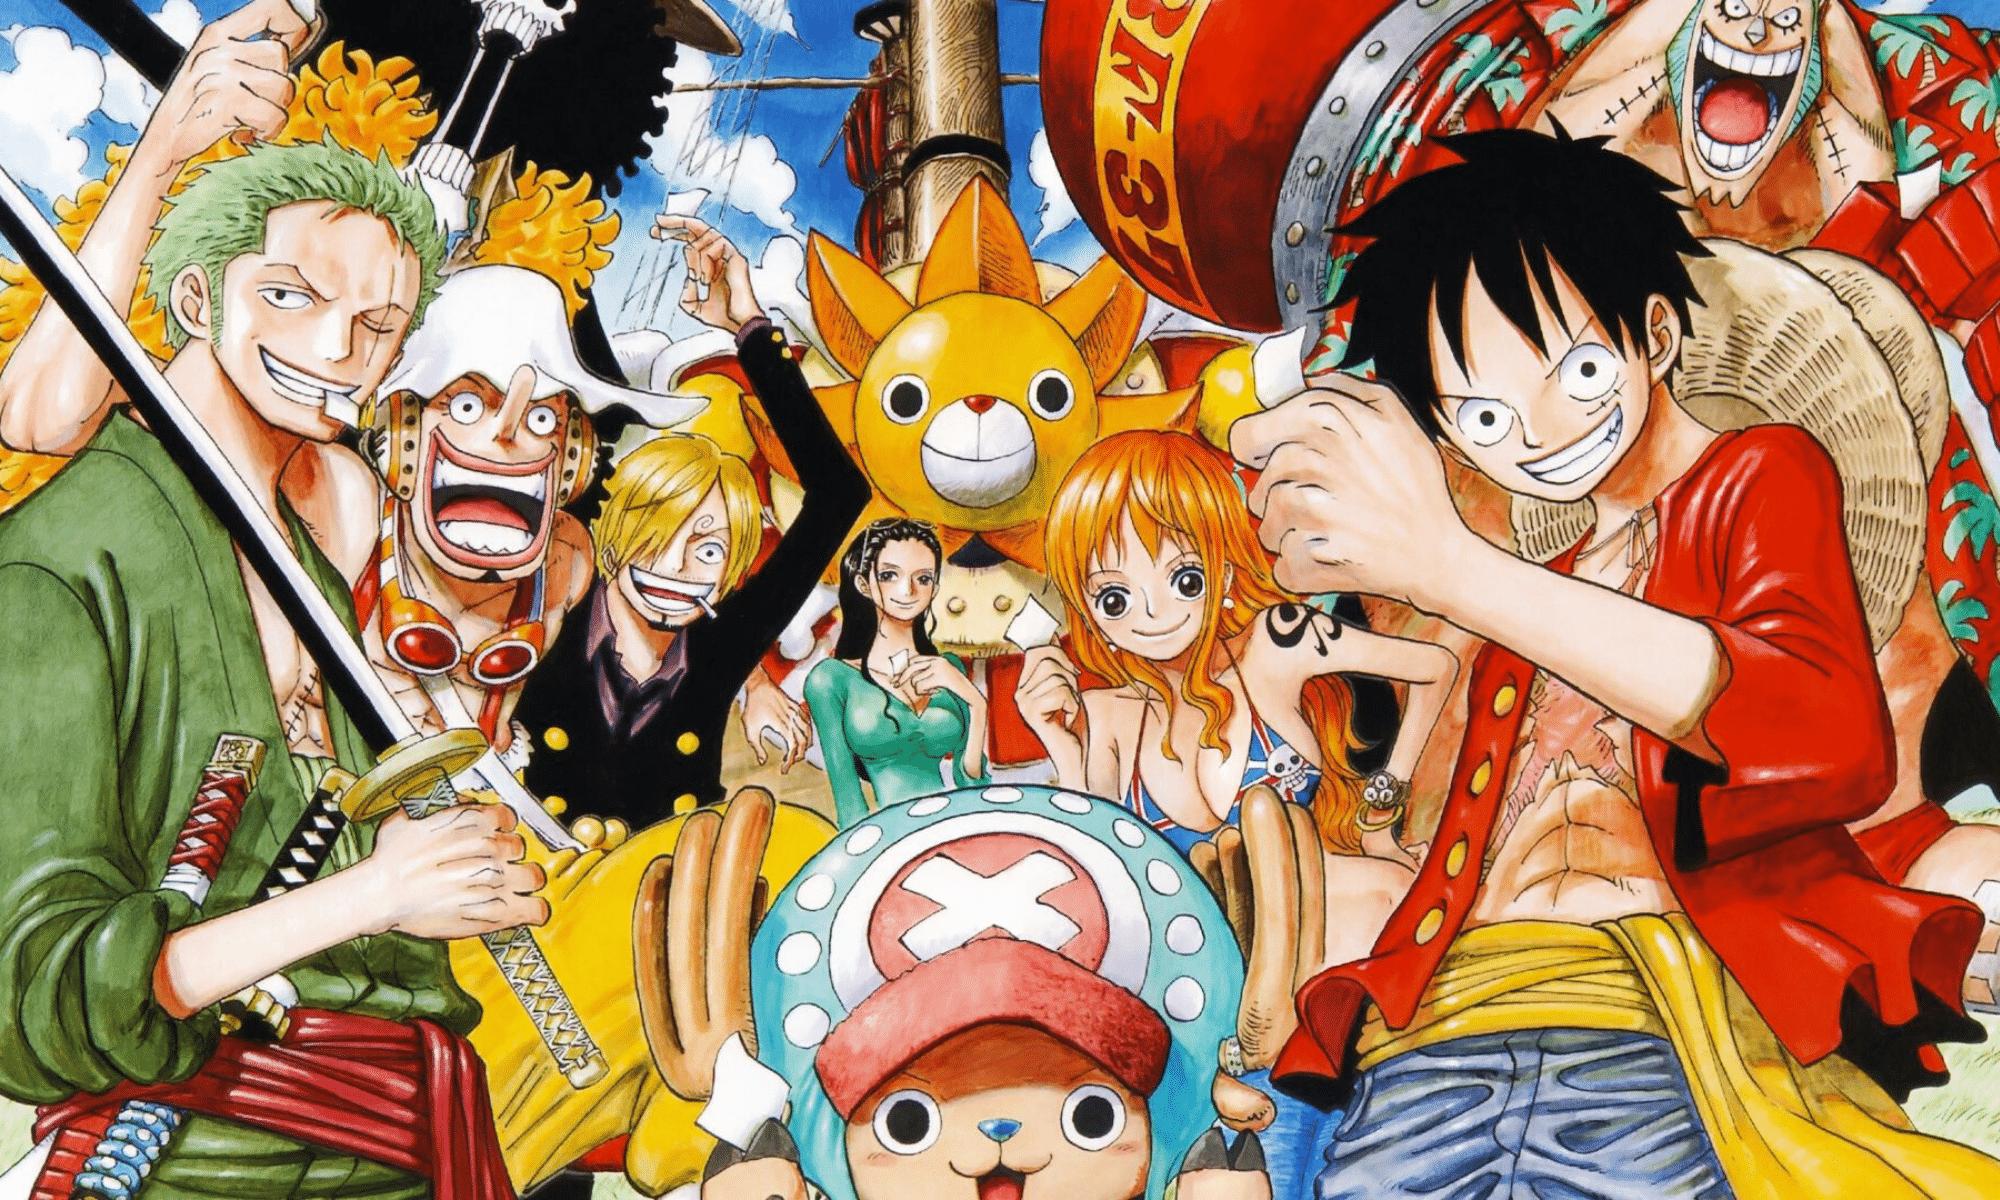 Reserva One Piece Limited Collector's Edition Volumen 99